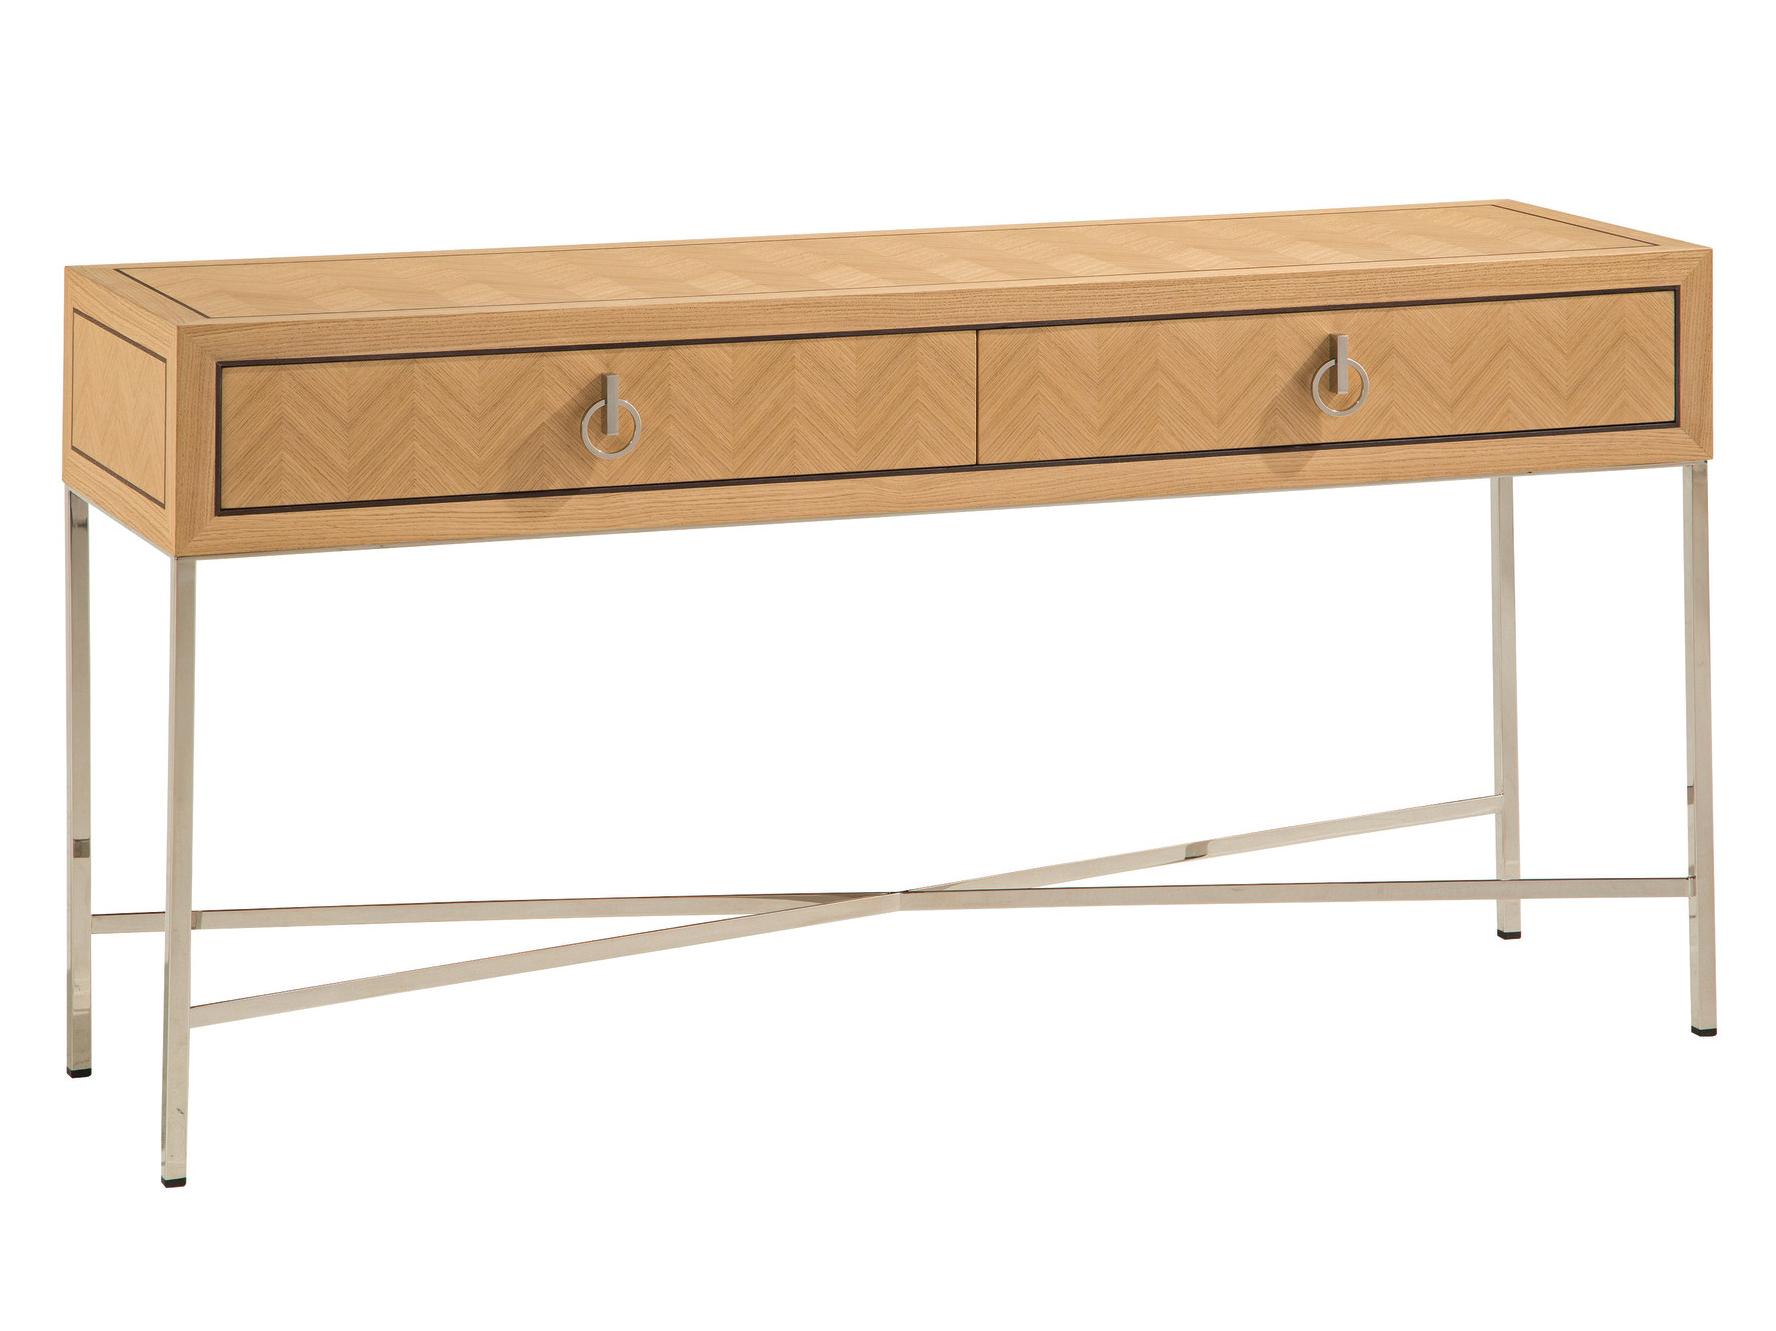 bahut roche bobois top mesmerizing roche bobois dining table dining table roche bobois dining. Black Bedroom Furniture Sets. Home Design Ideas